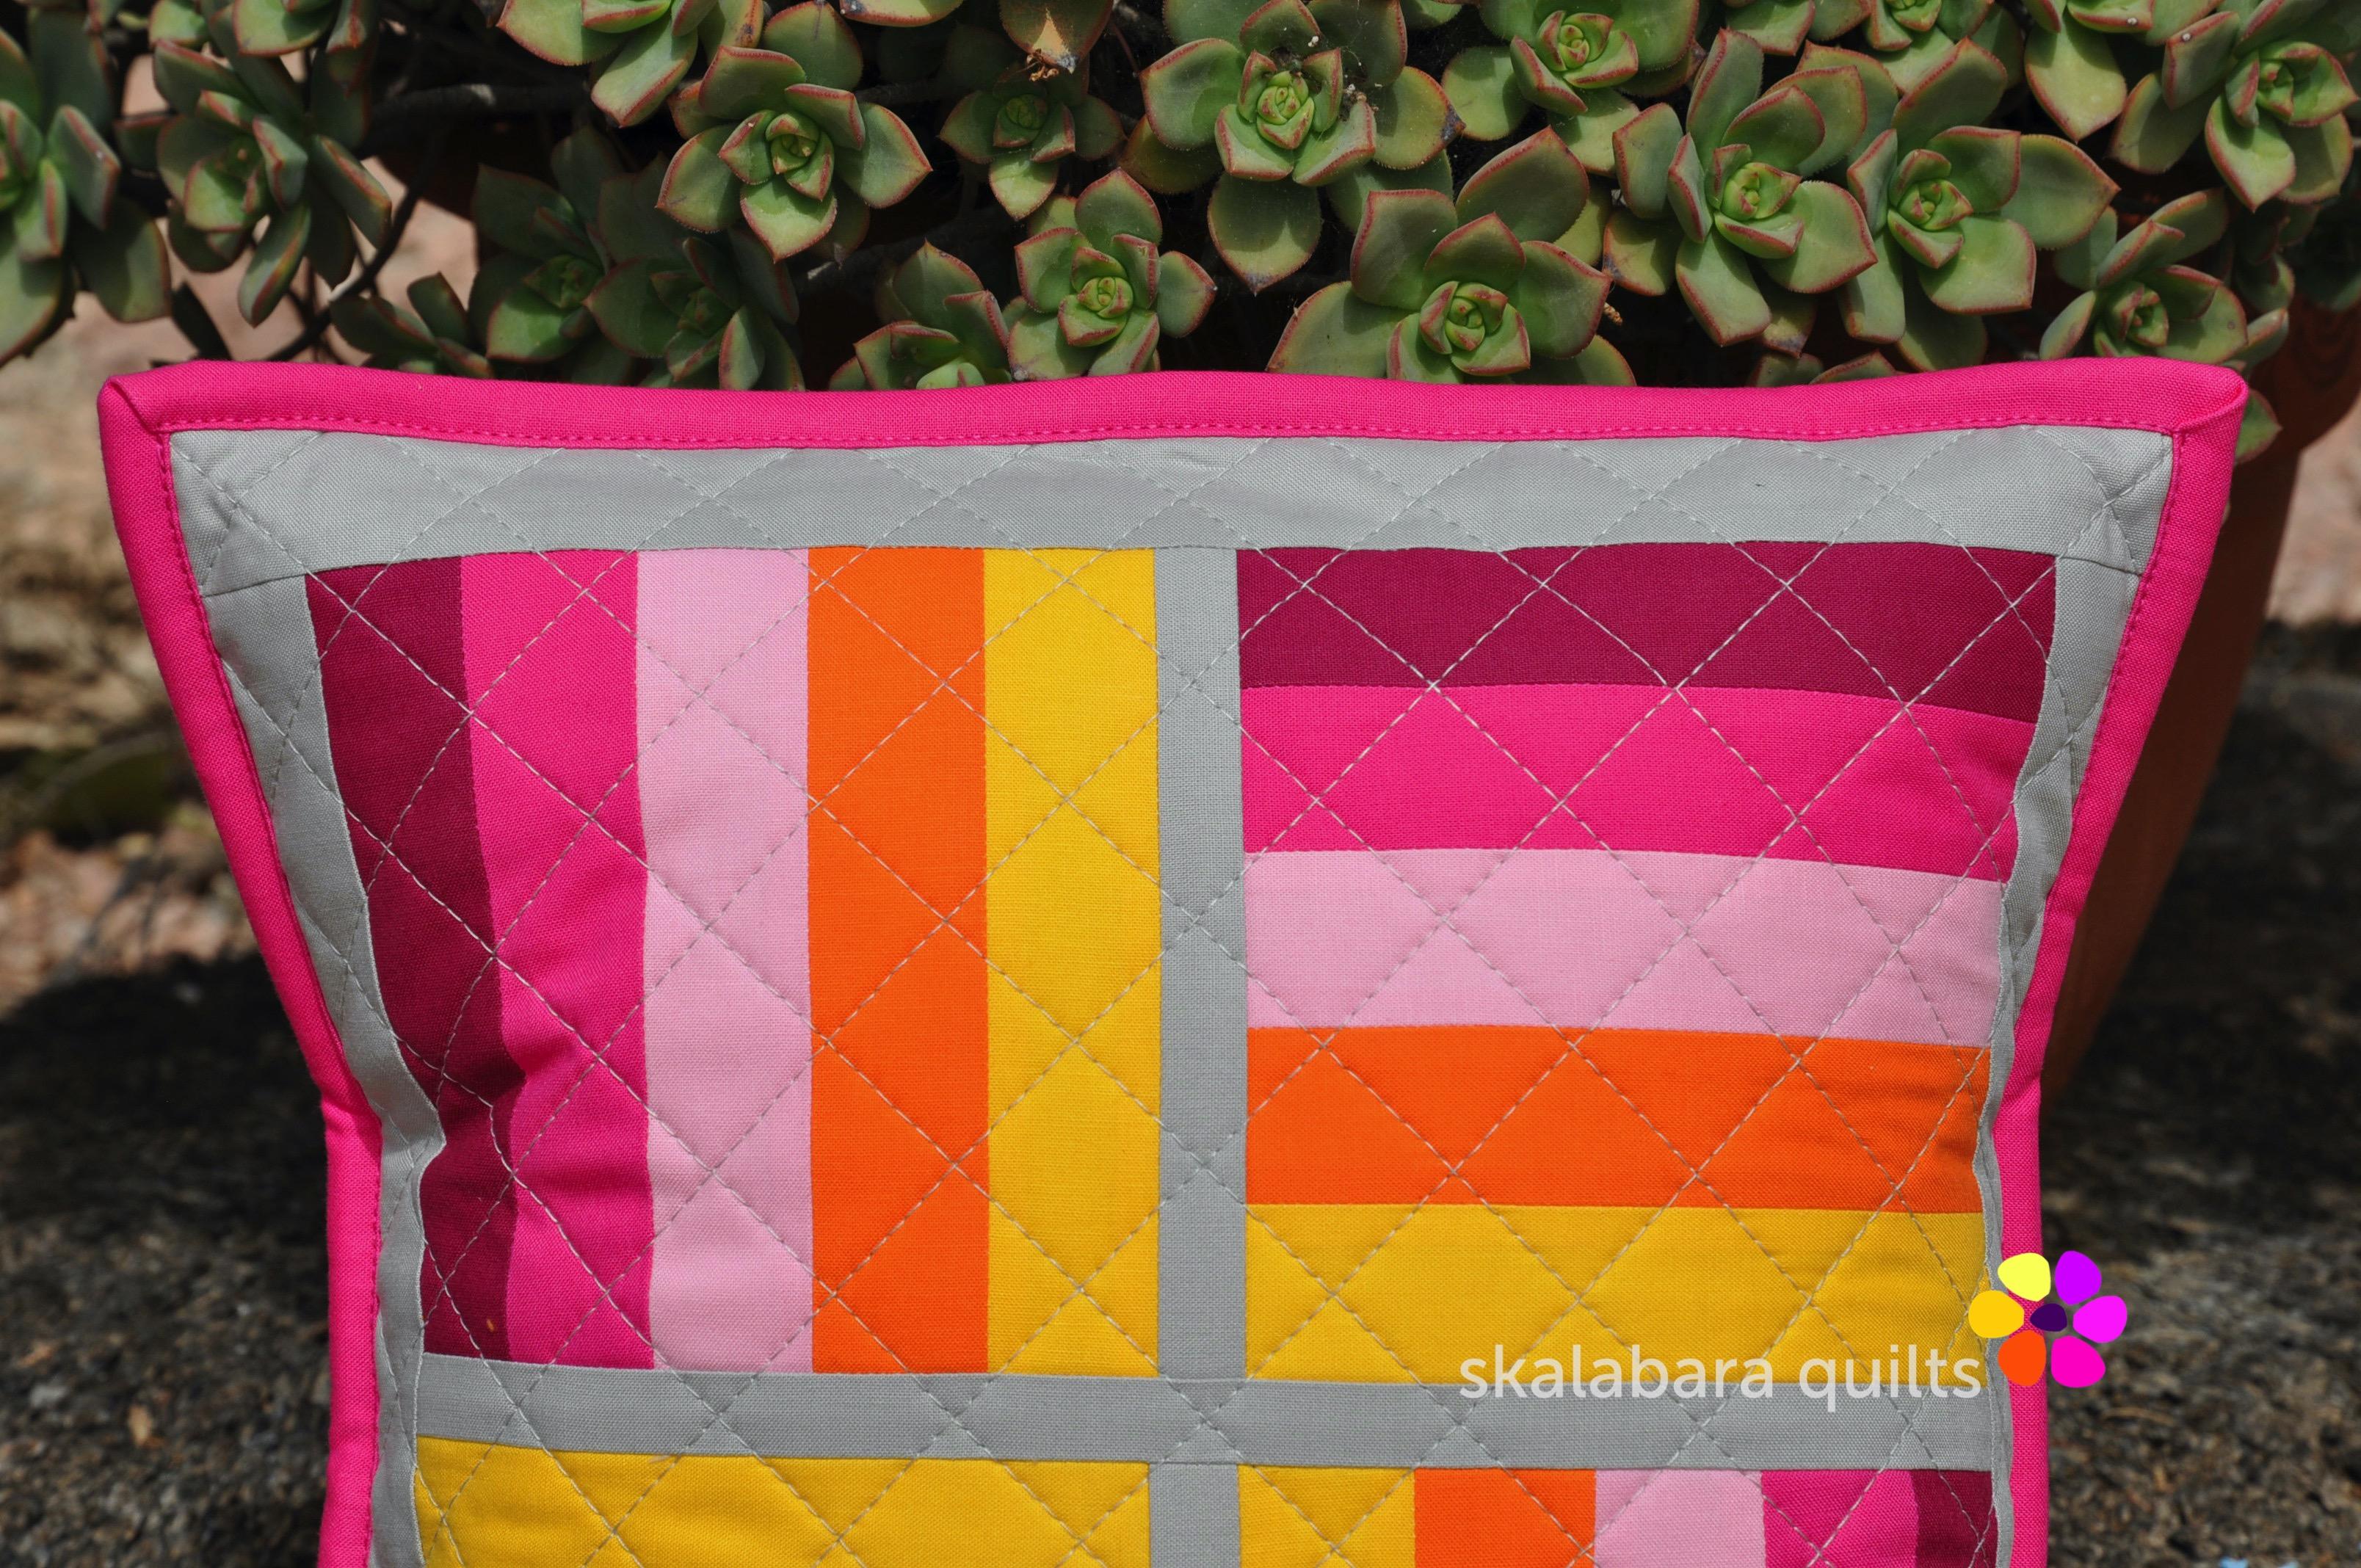 april pinkie cushions detail 1 - skalabara quilts